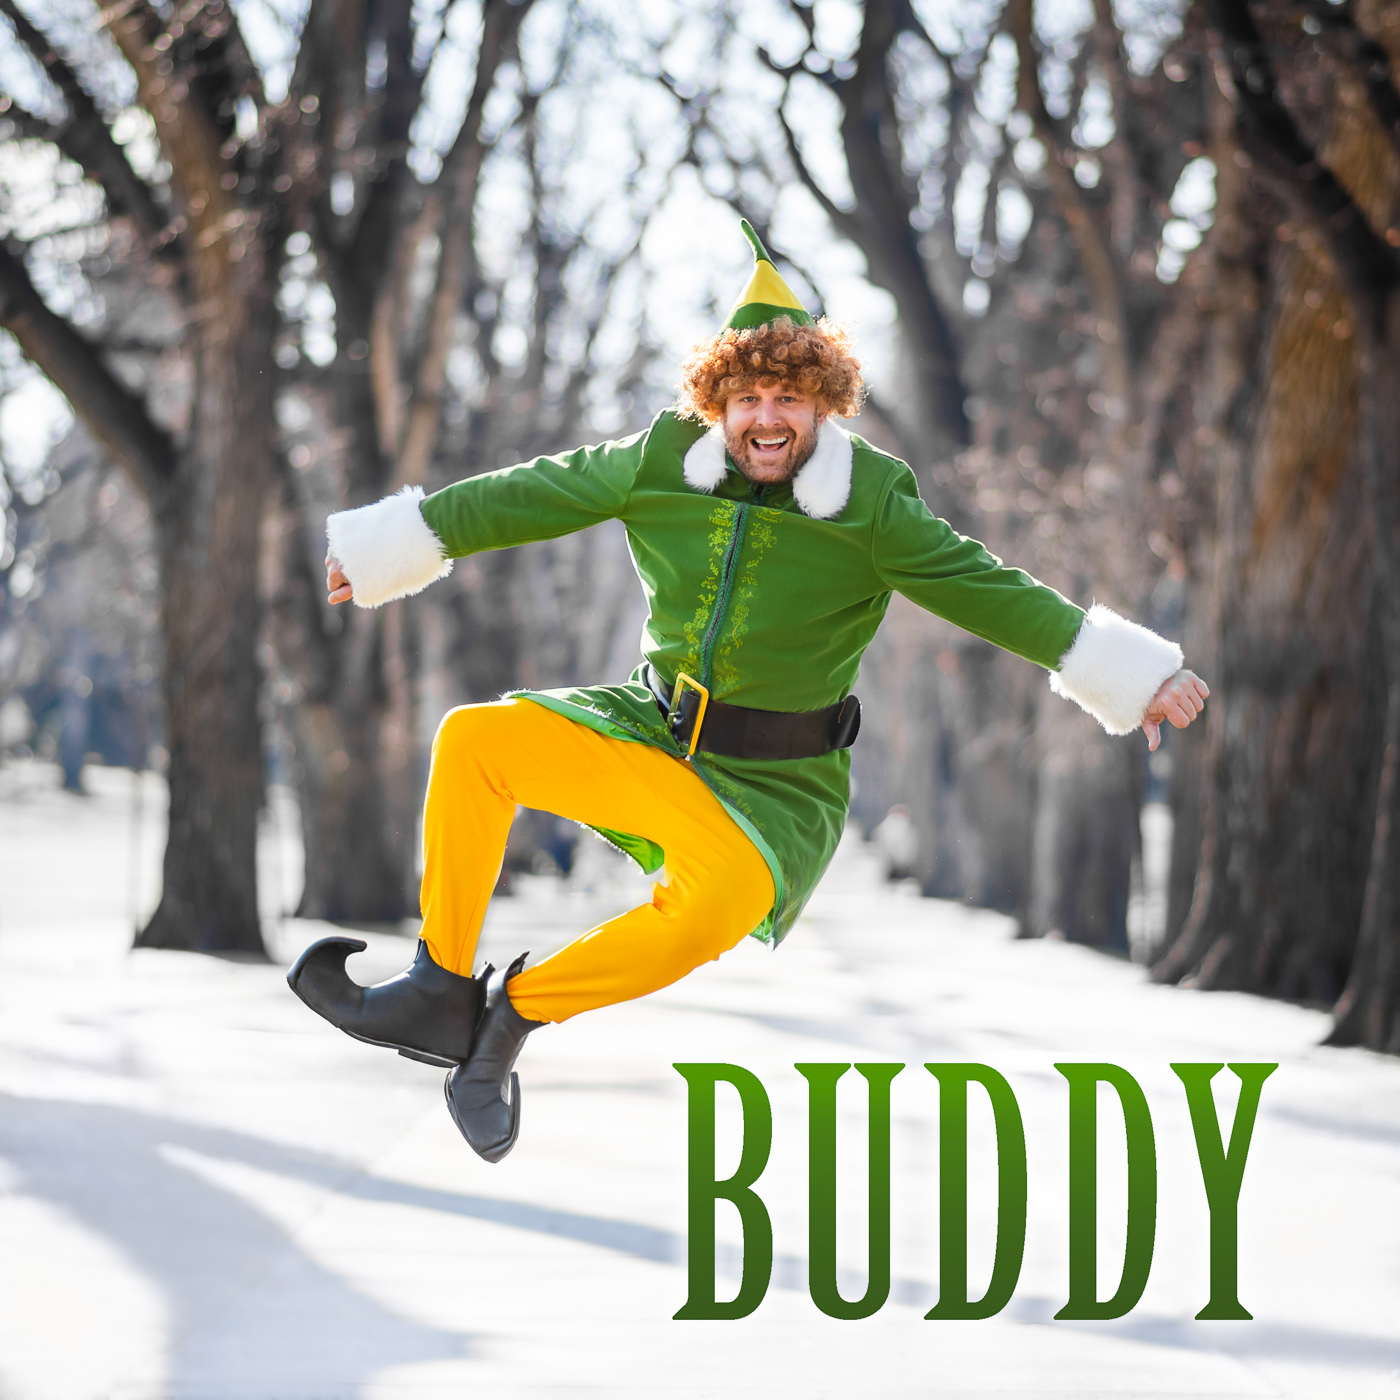 PHOCO Christmas Card Colorado Fort Collins Photographer CSU Oval Buddy the Elf.jpg